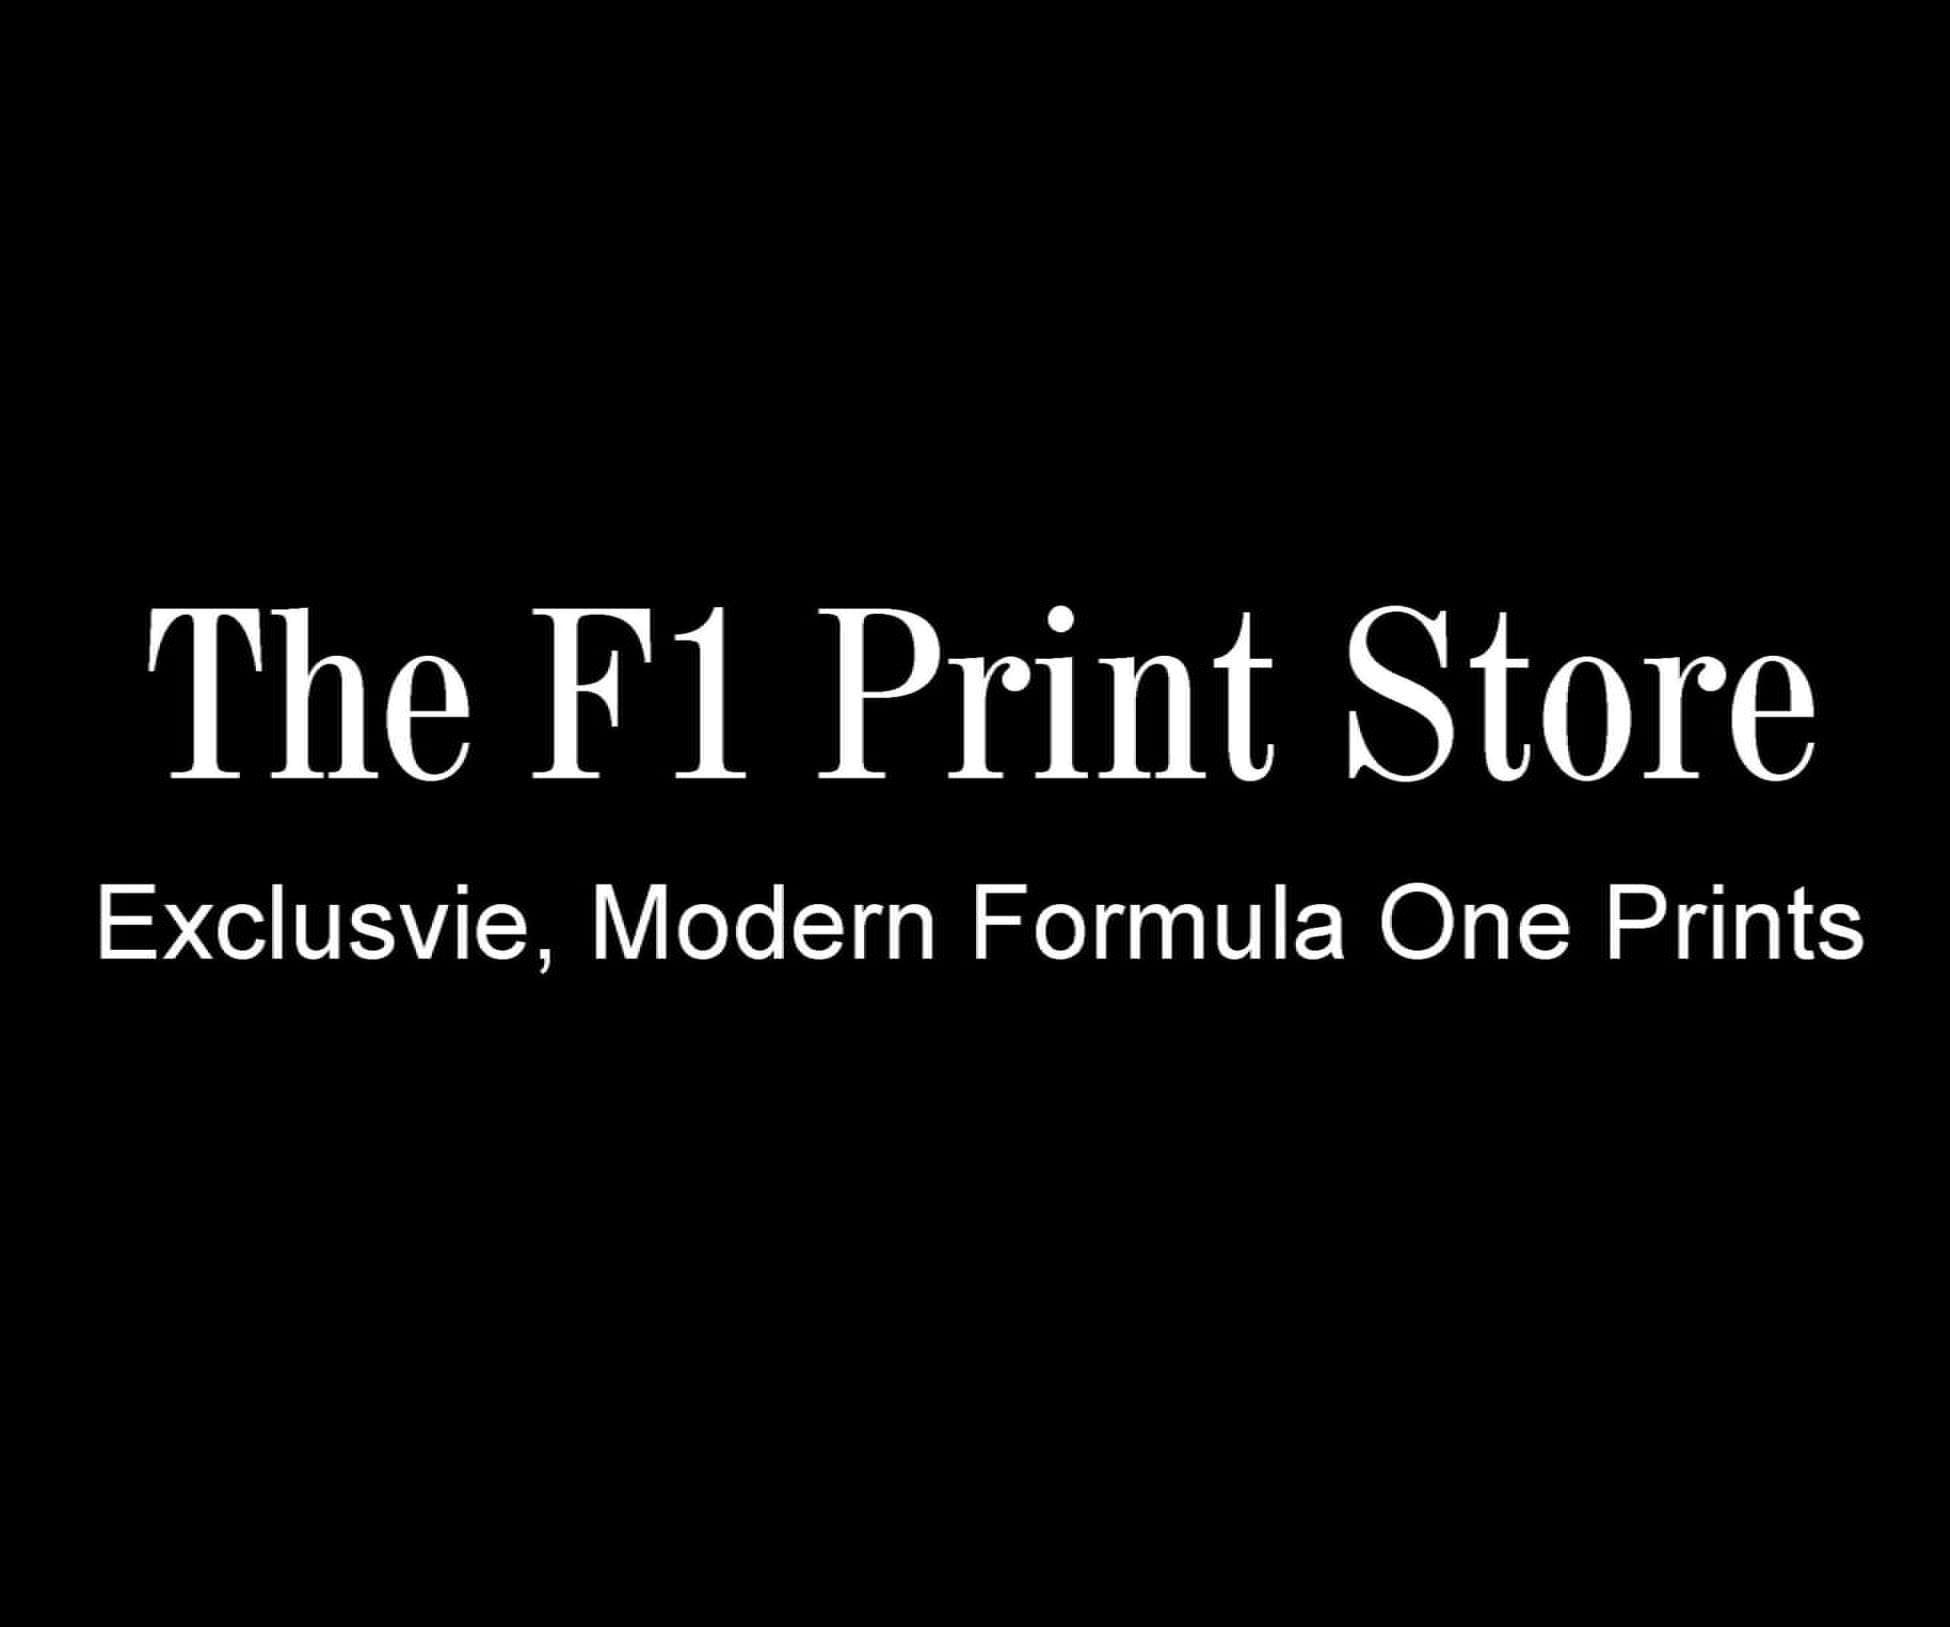 The GPBox - F1 Prints Store